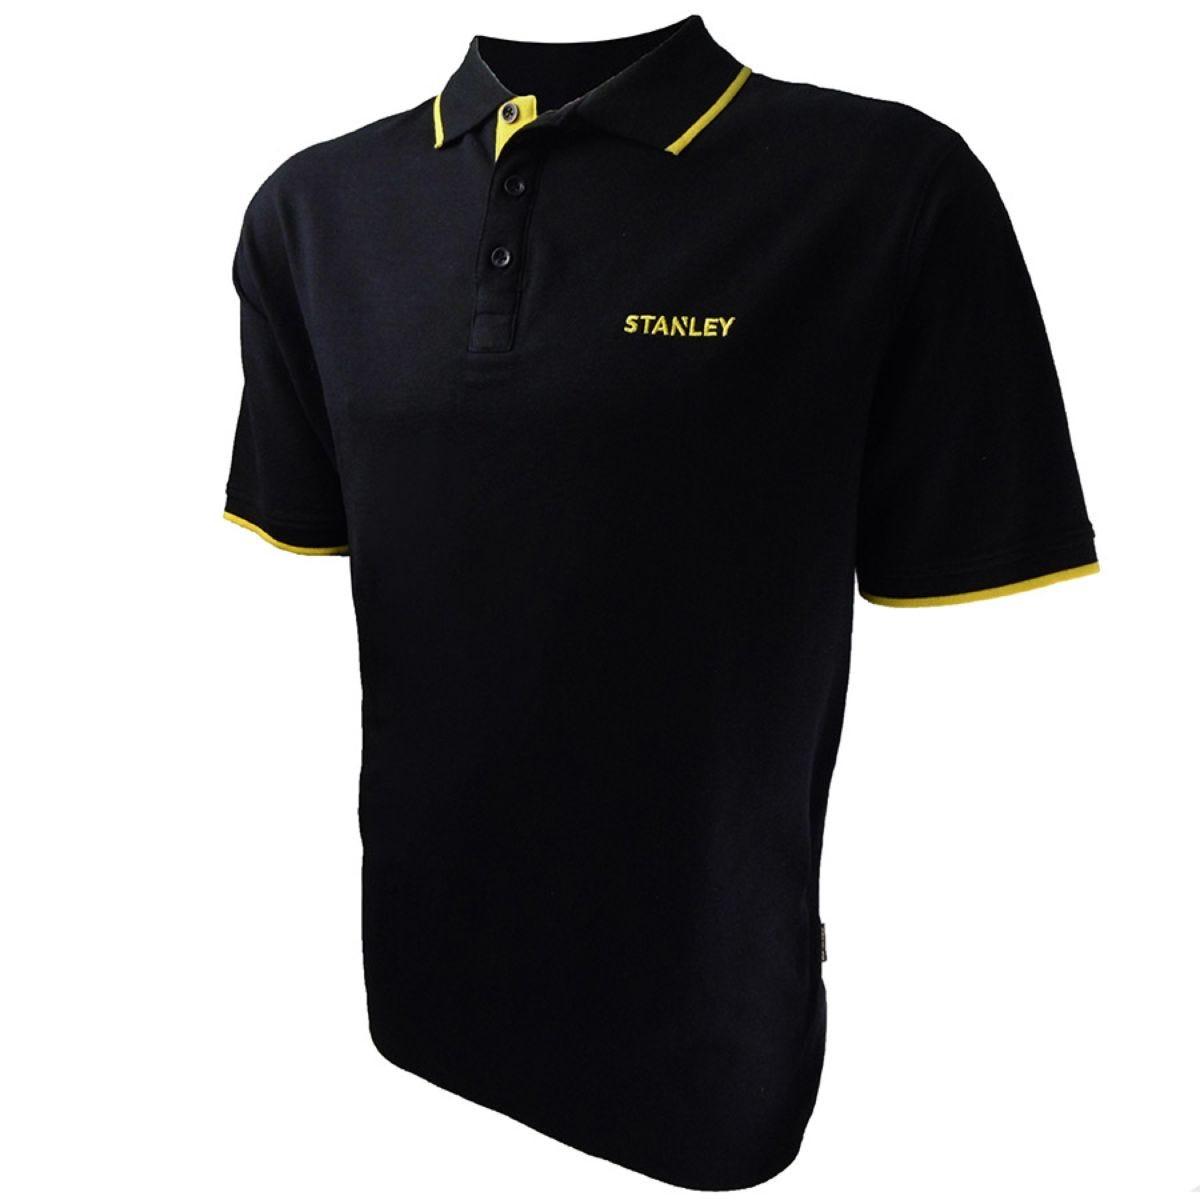 Stanley Workwear Texas Polo Shirt - Black